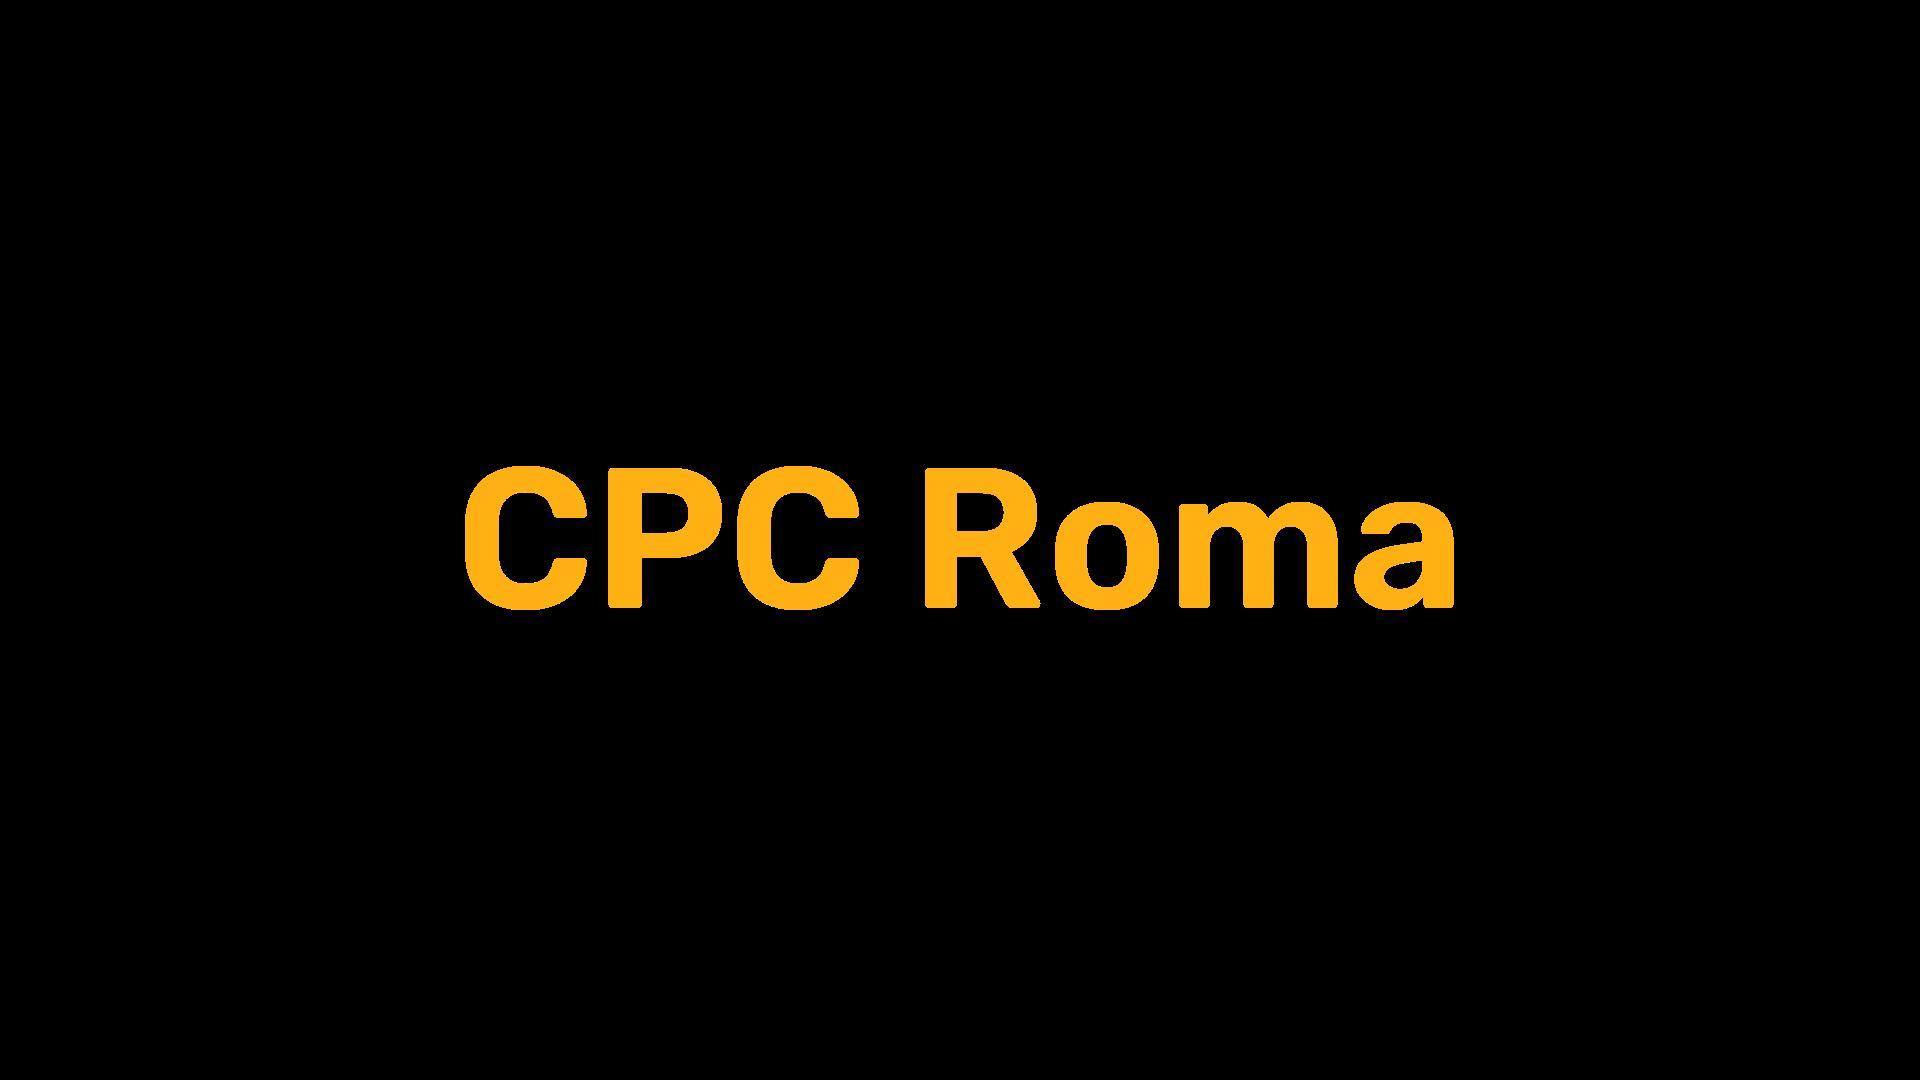 CPC Roma